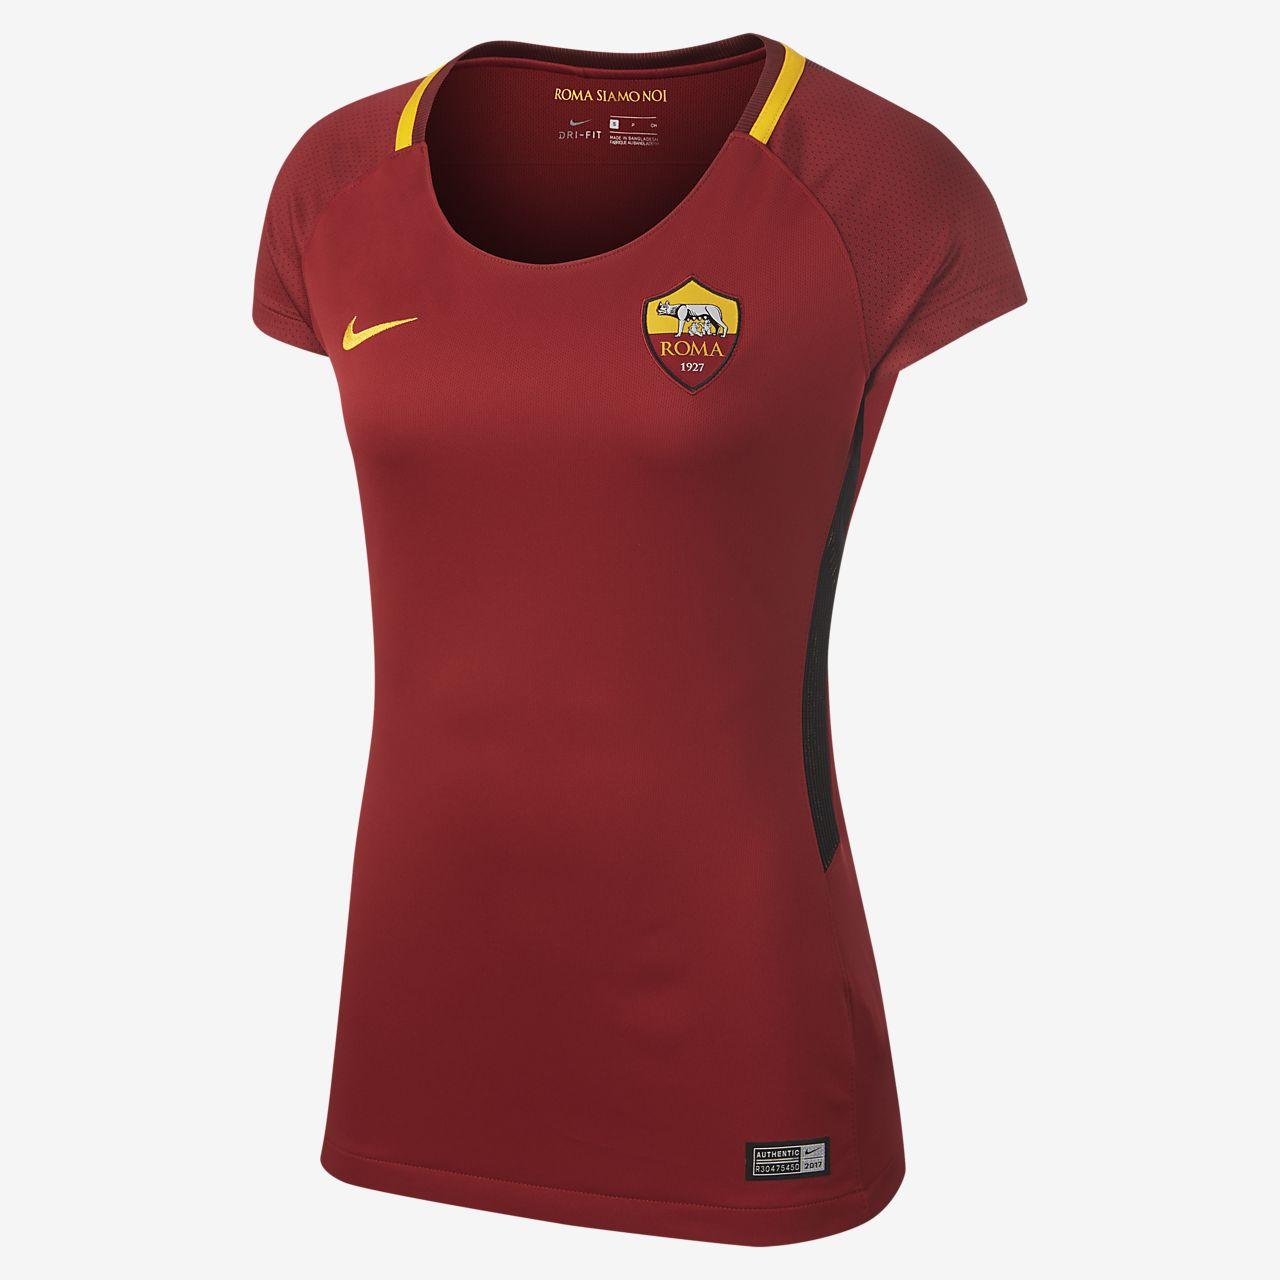 2017/18 A.S. Roma Stadium Home Women's Football Shirt